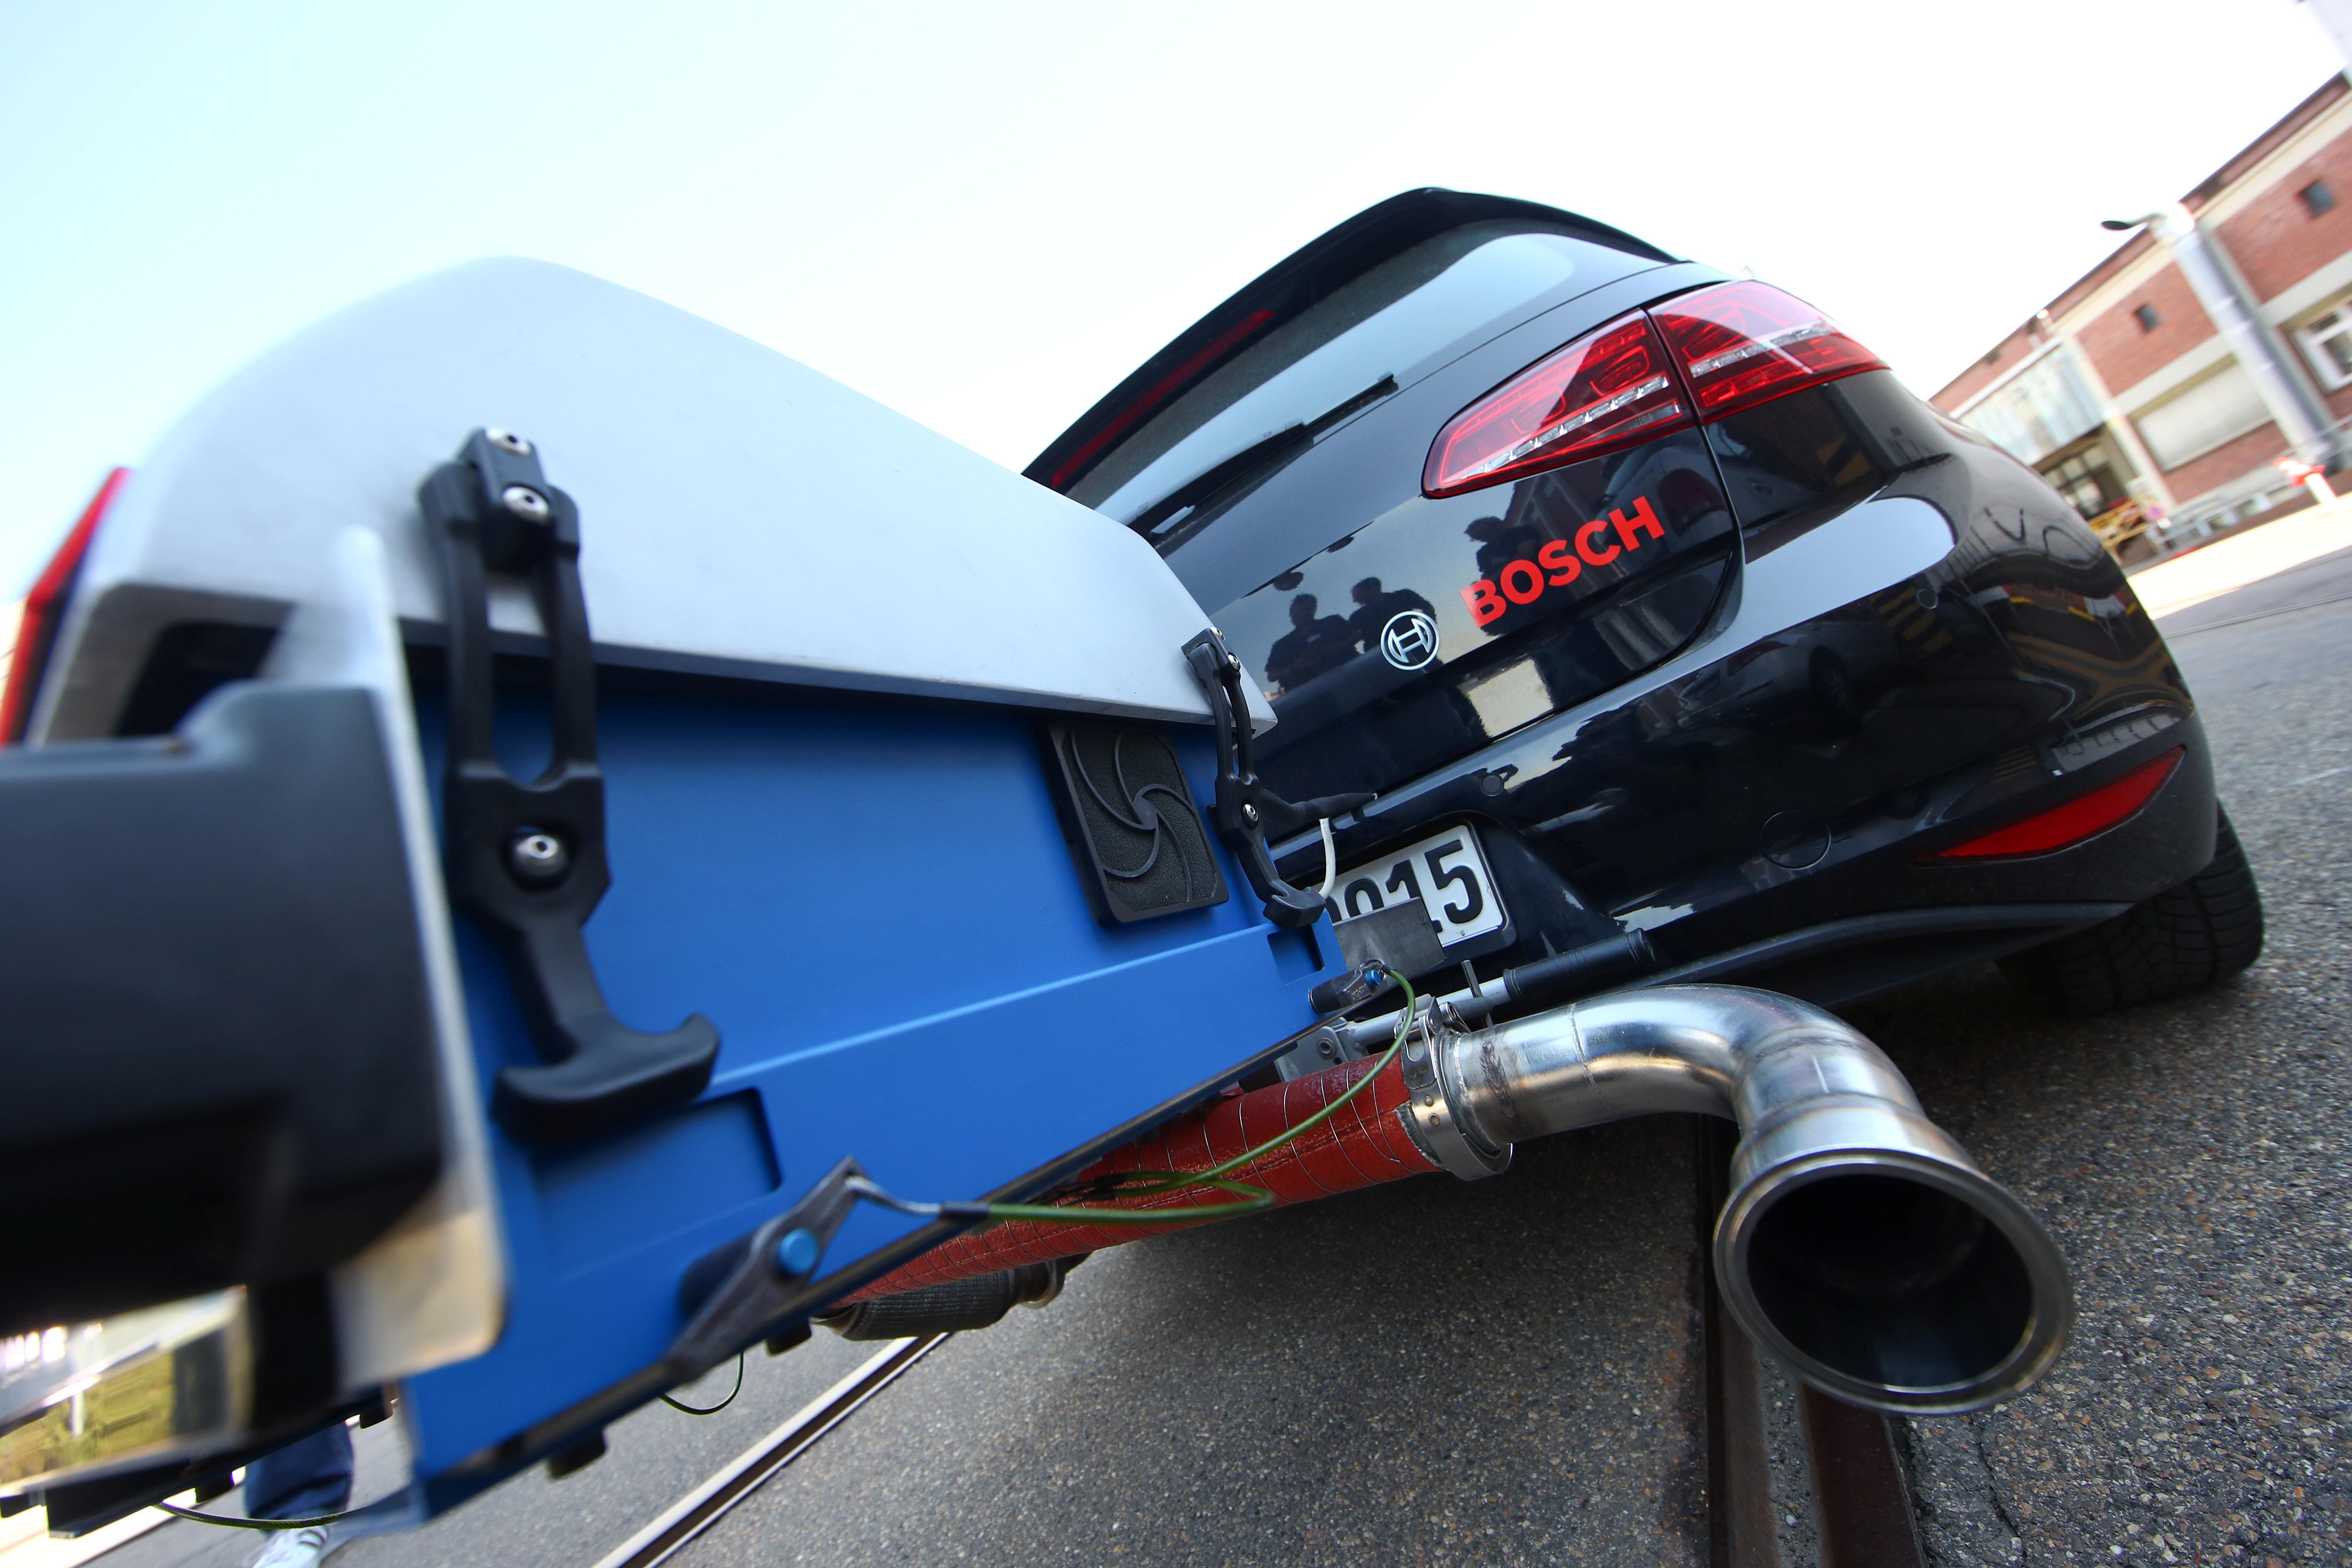 A Volkswagen VW Golf test vehicle featuring Bosch's new diesel technology is seen at the Bosch factory in Stuttgart, Germany April 17, 2018. REUTERS/Michael Dalder